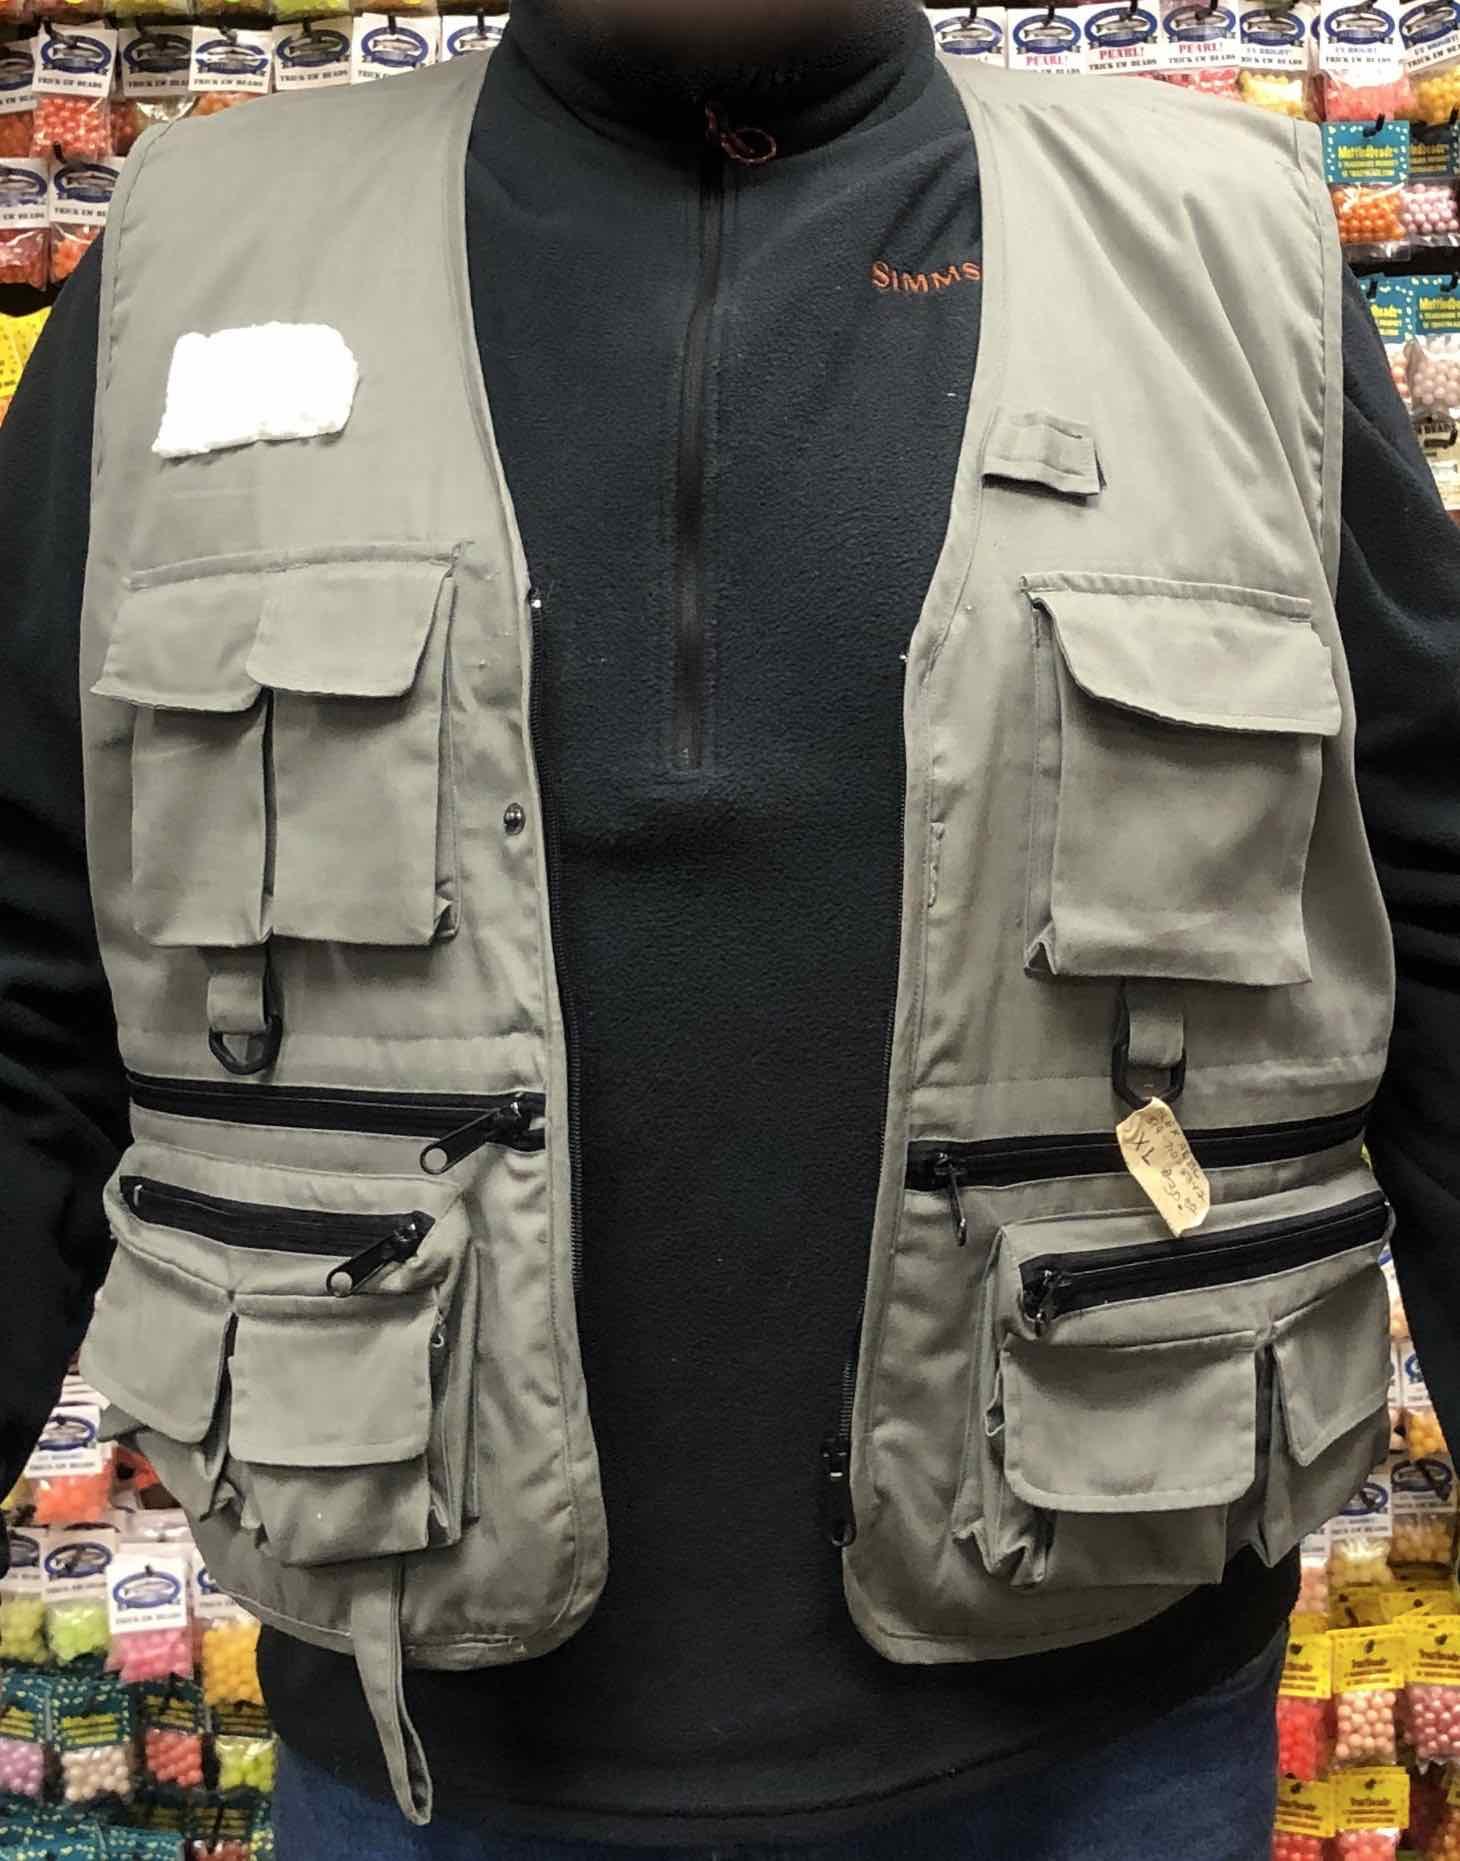 Fishpond Steelhead Vest - Size XL - GREAT SHAPE! - $30